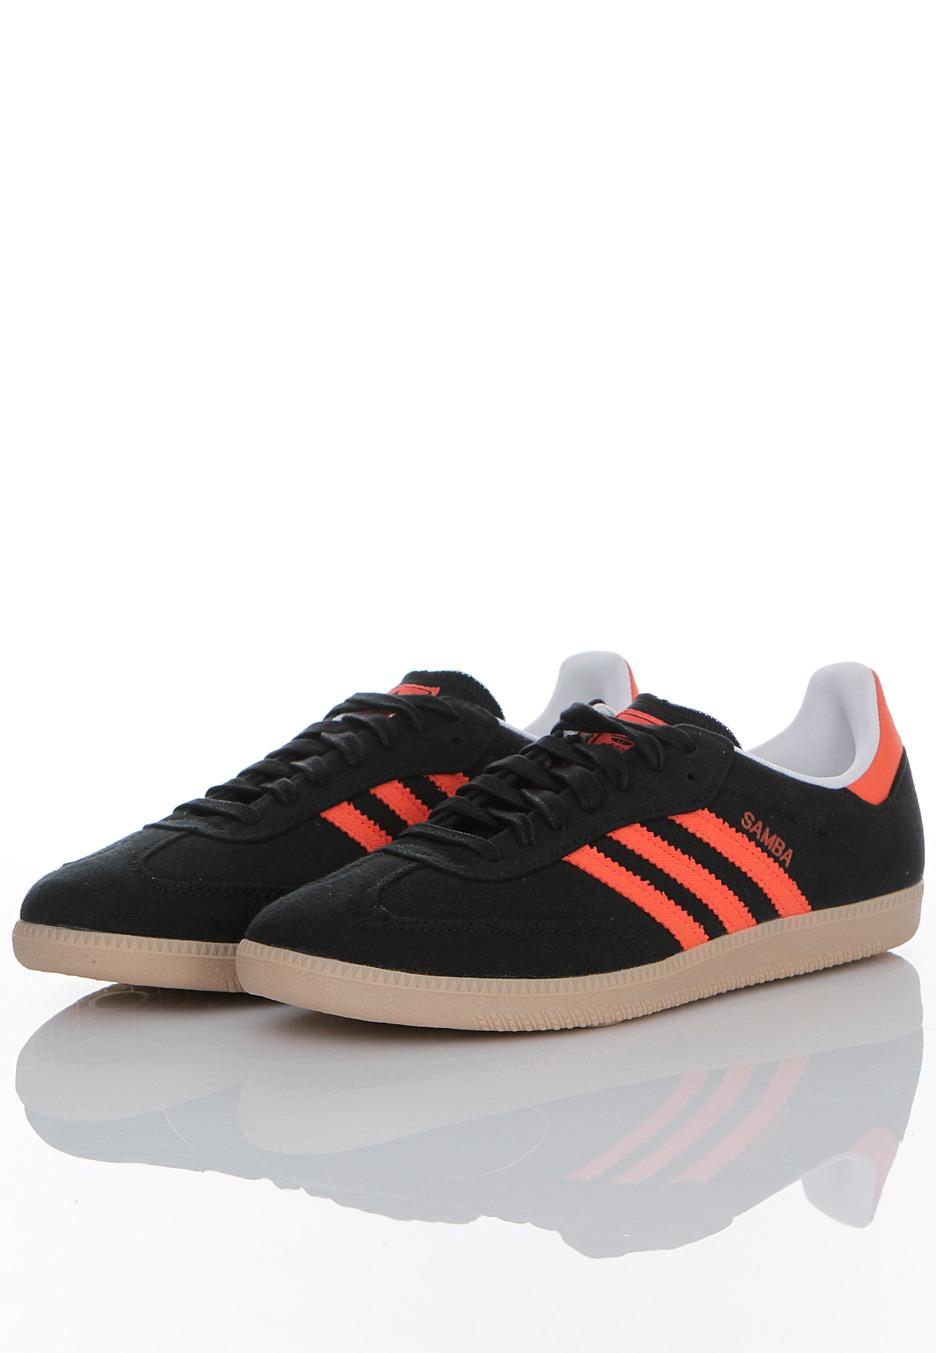 denmark adidas samba orange black 04bb1 dc23b